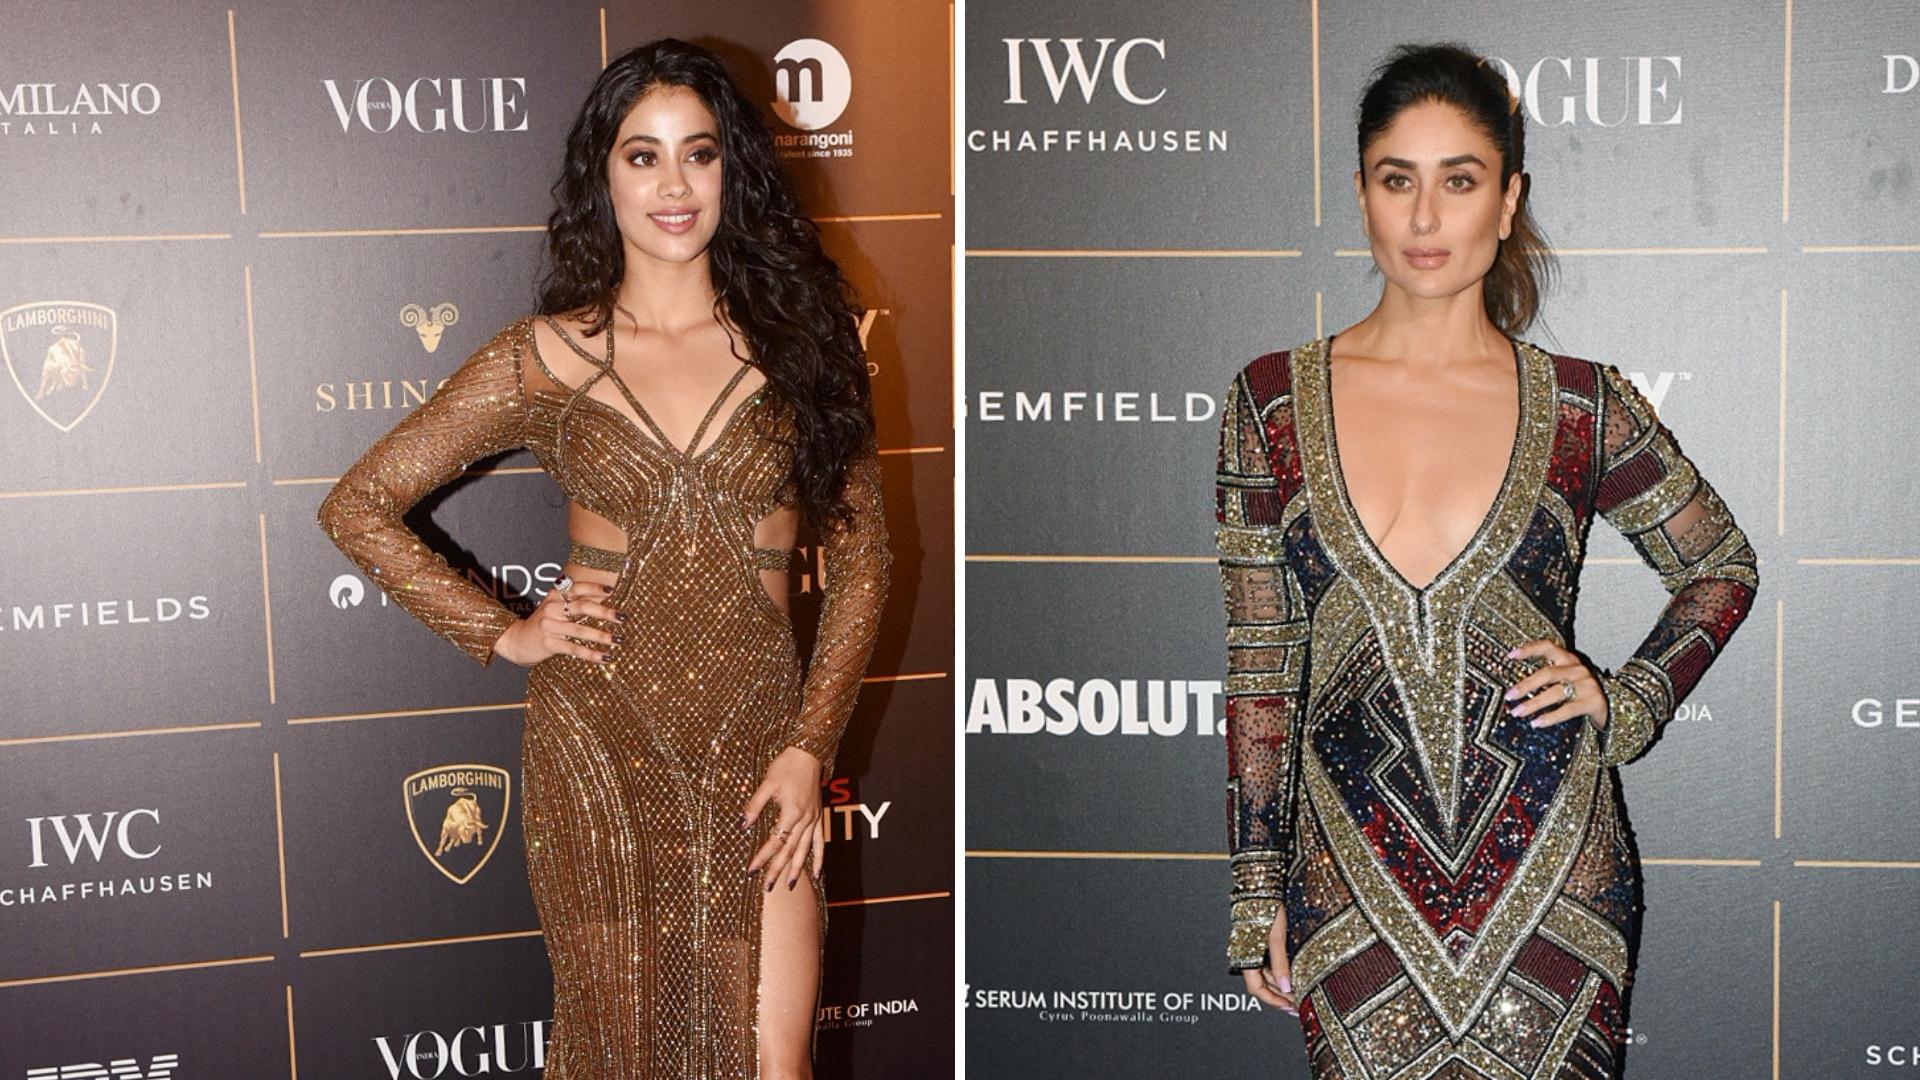 In Pics: Alia Bhatt, Janhvi and Kareena Kapoor at Vogue Awards